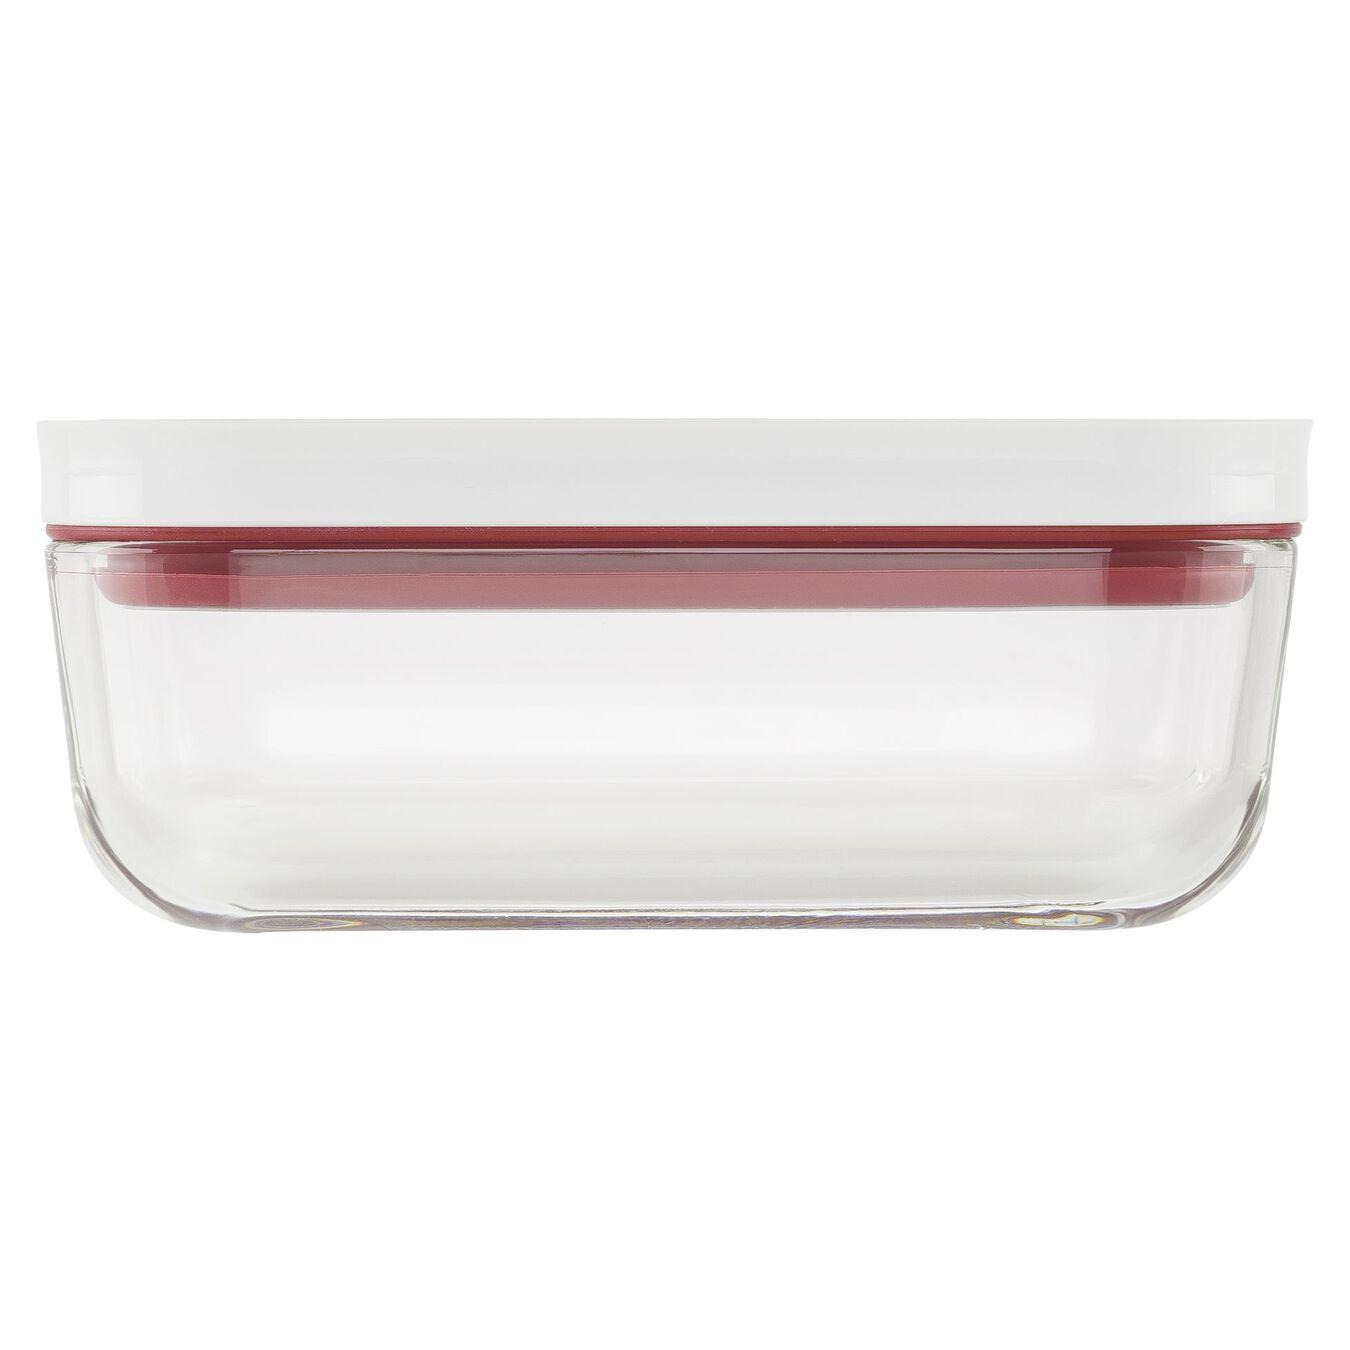 Vakuumbox, S, Glas, Rot,,large 3